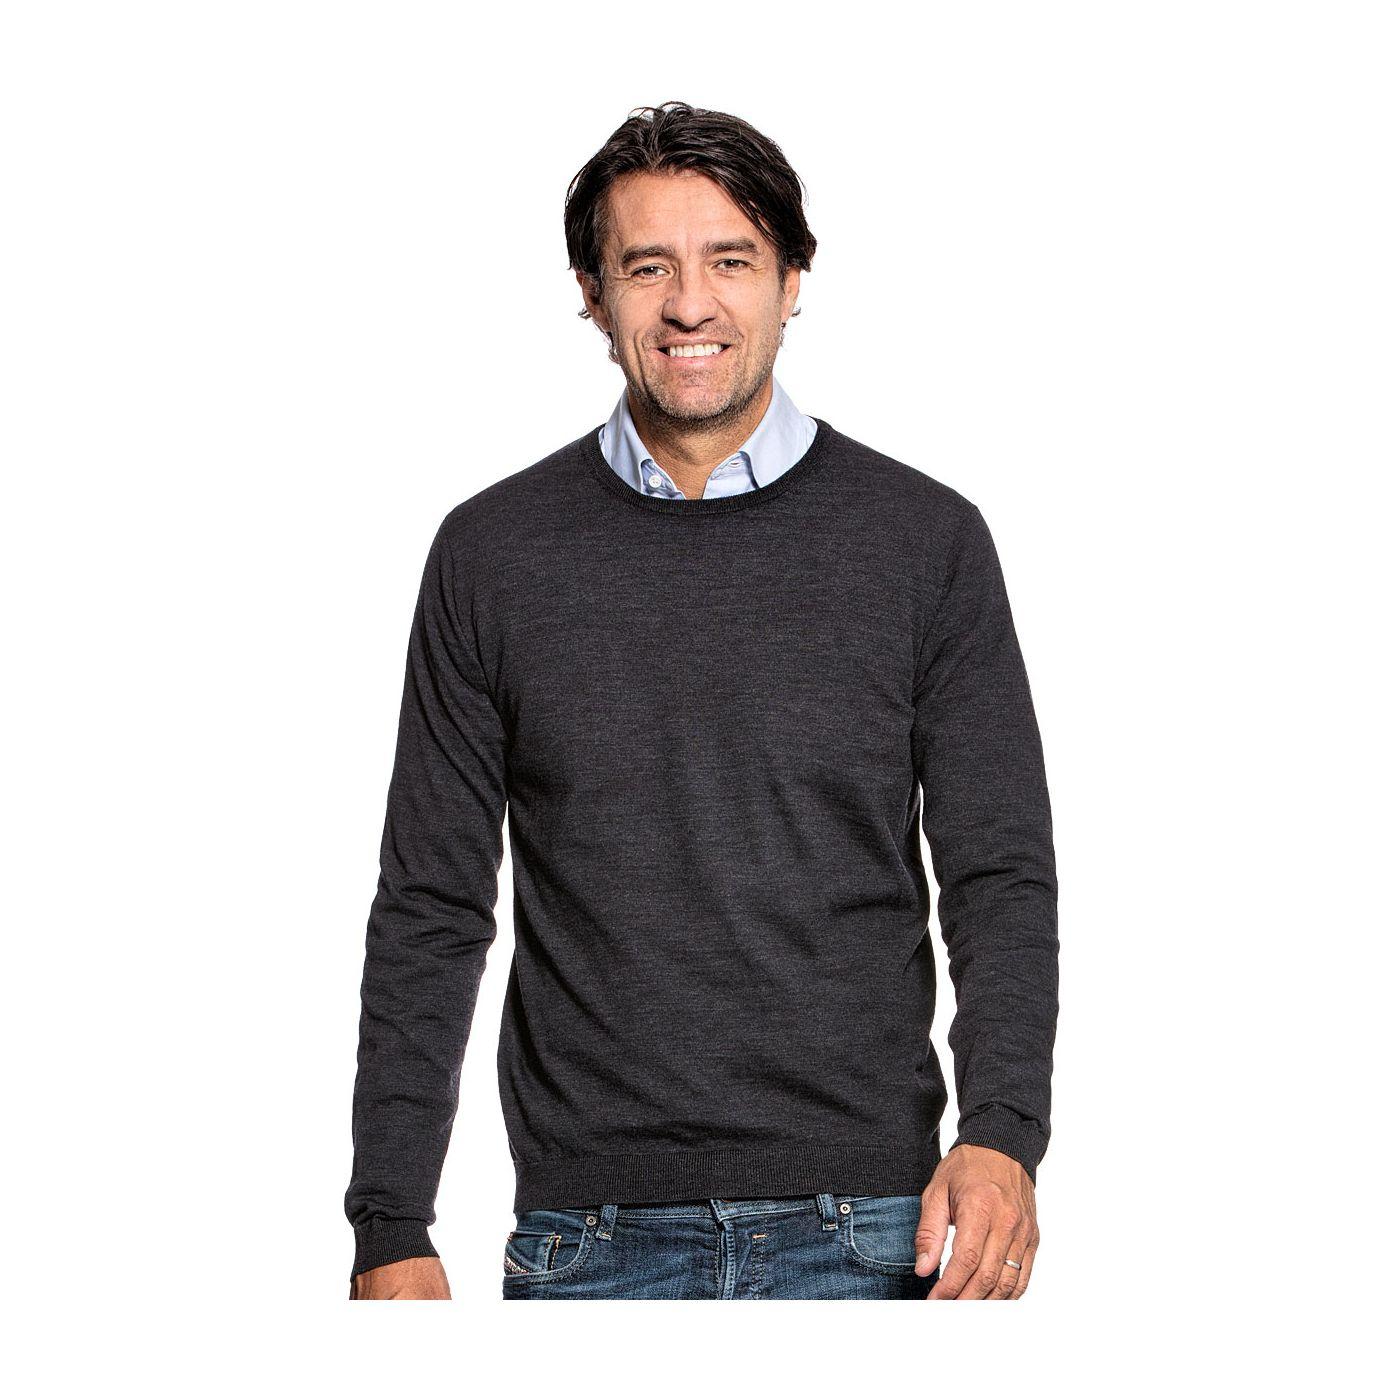 Crew neck sweater for men made of Merino wool in Dark grey